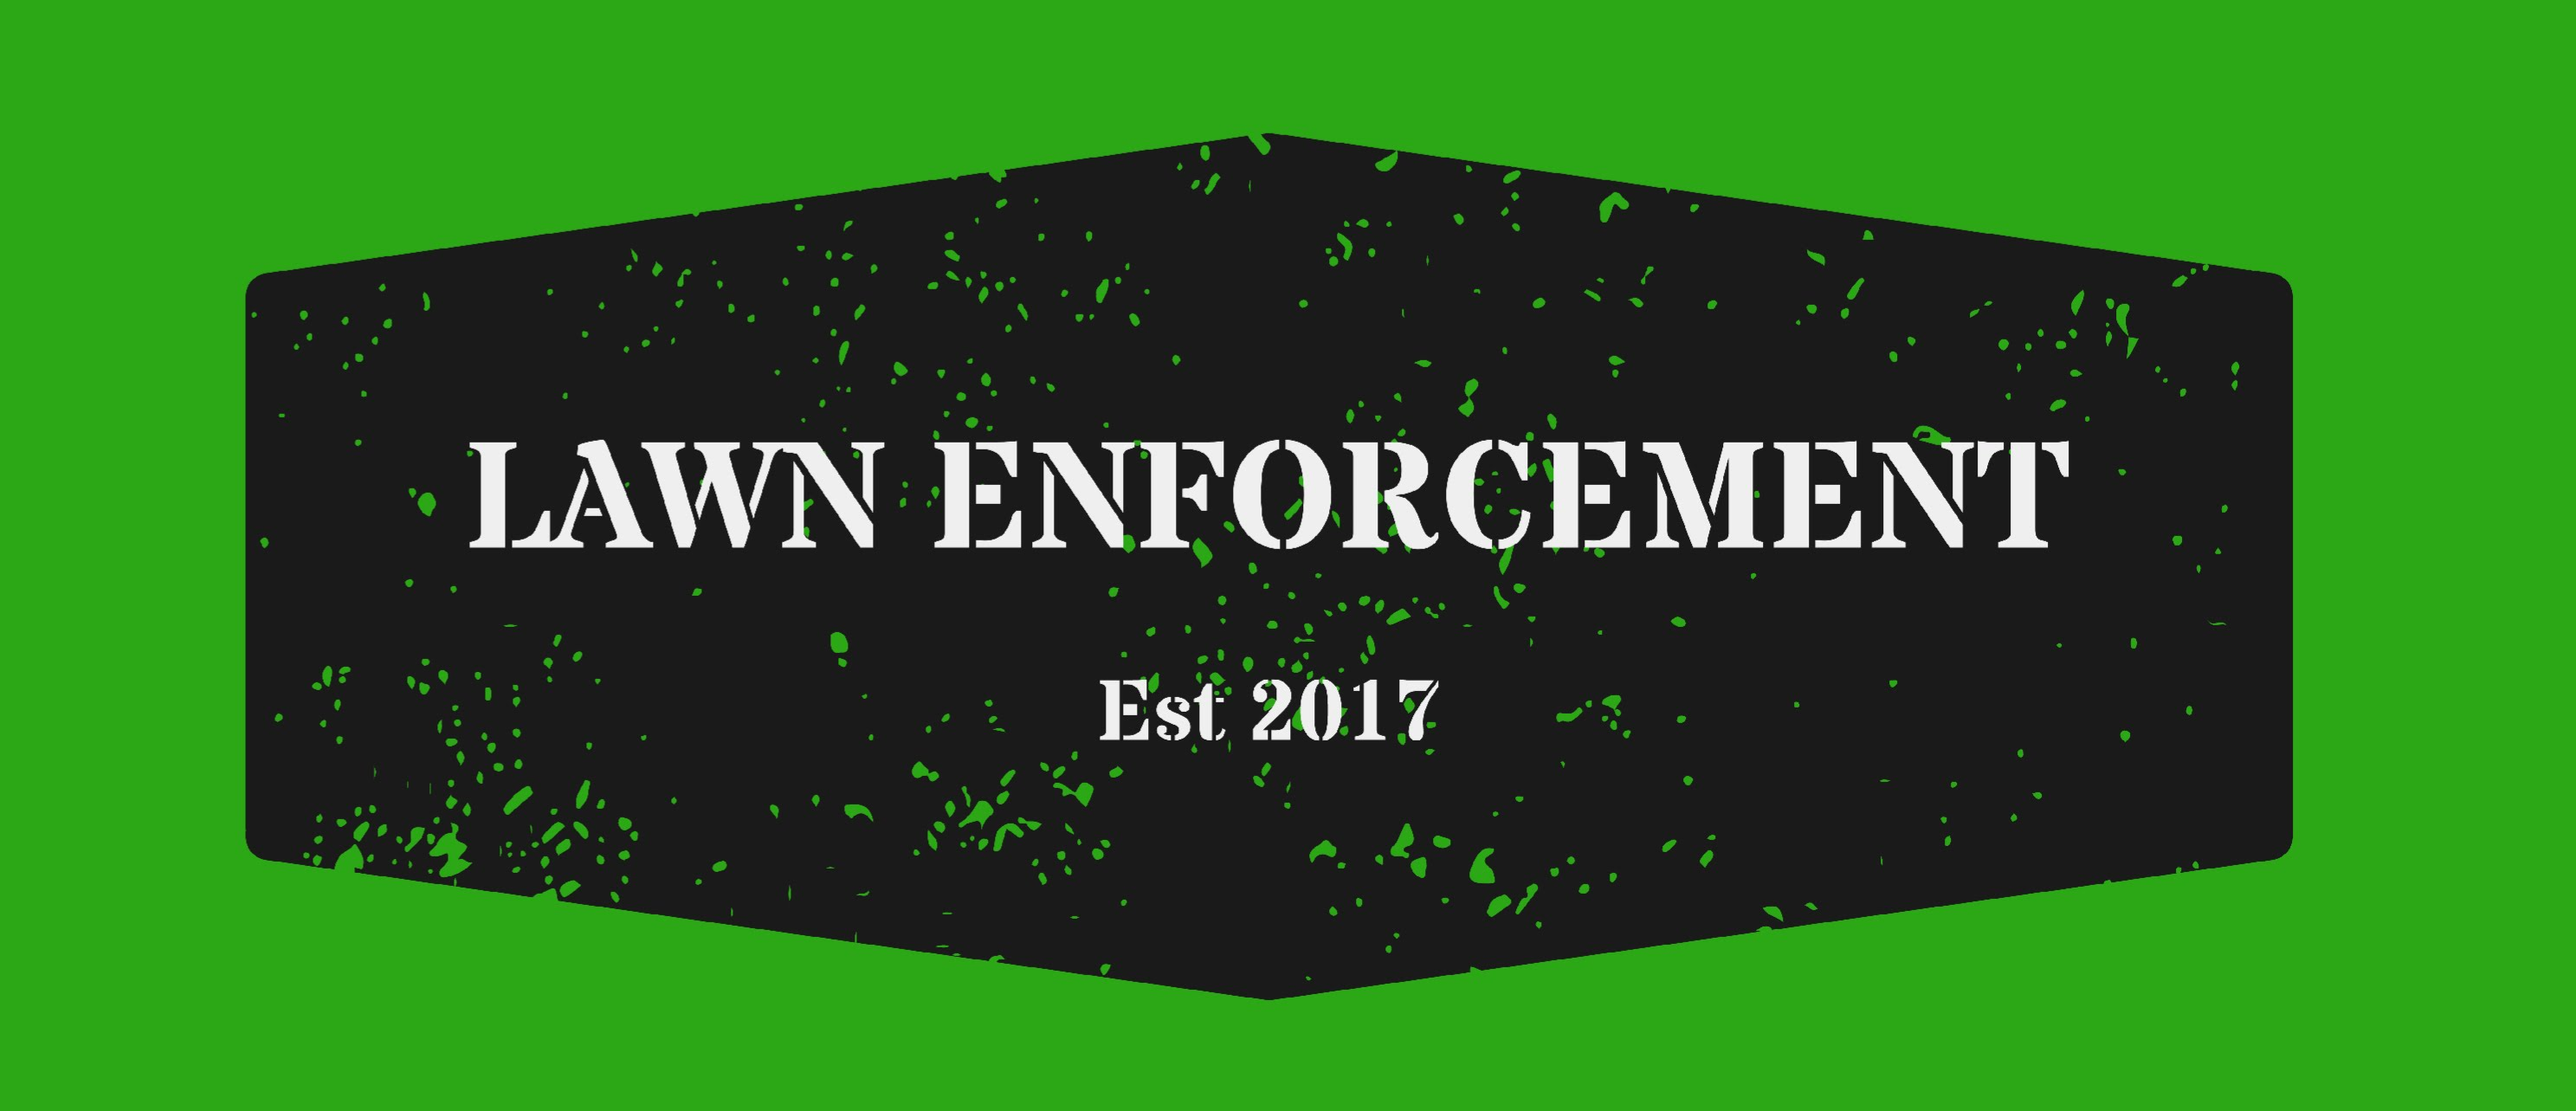 Lawn Enforcement